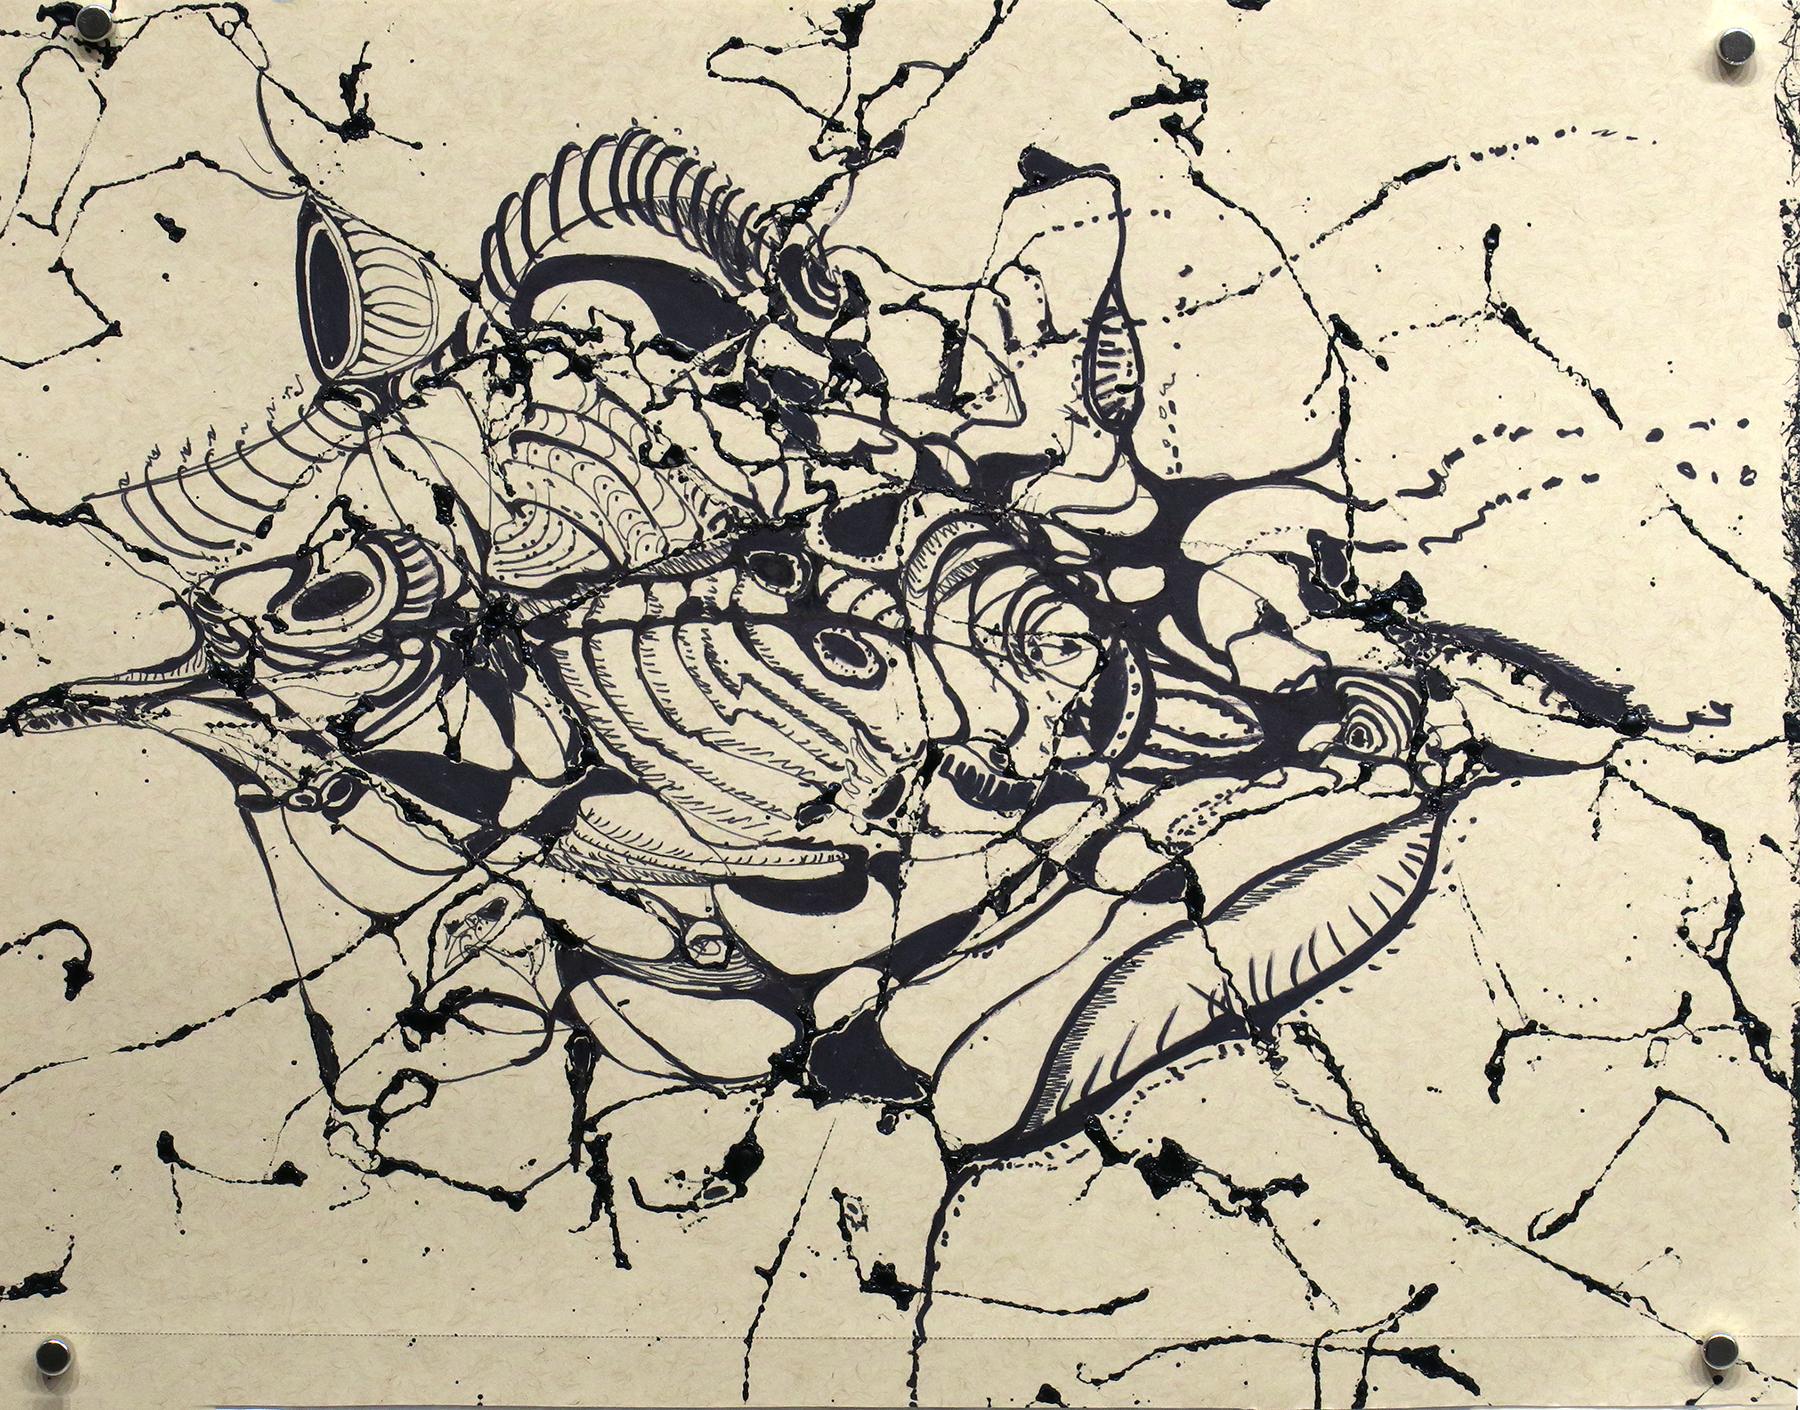 Kathryn Hart, Daunting Transitions, Krakow, Ink Drawing 5